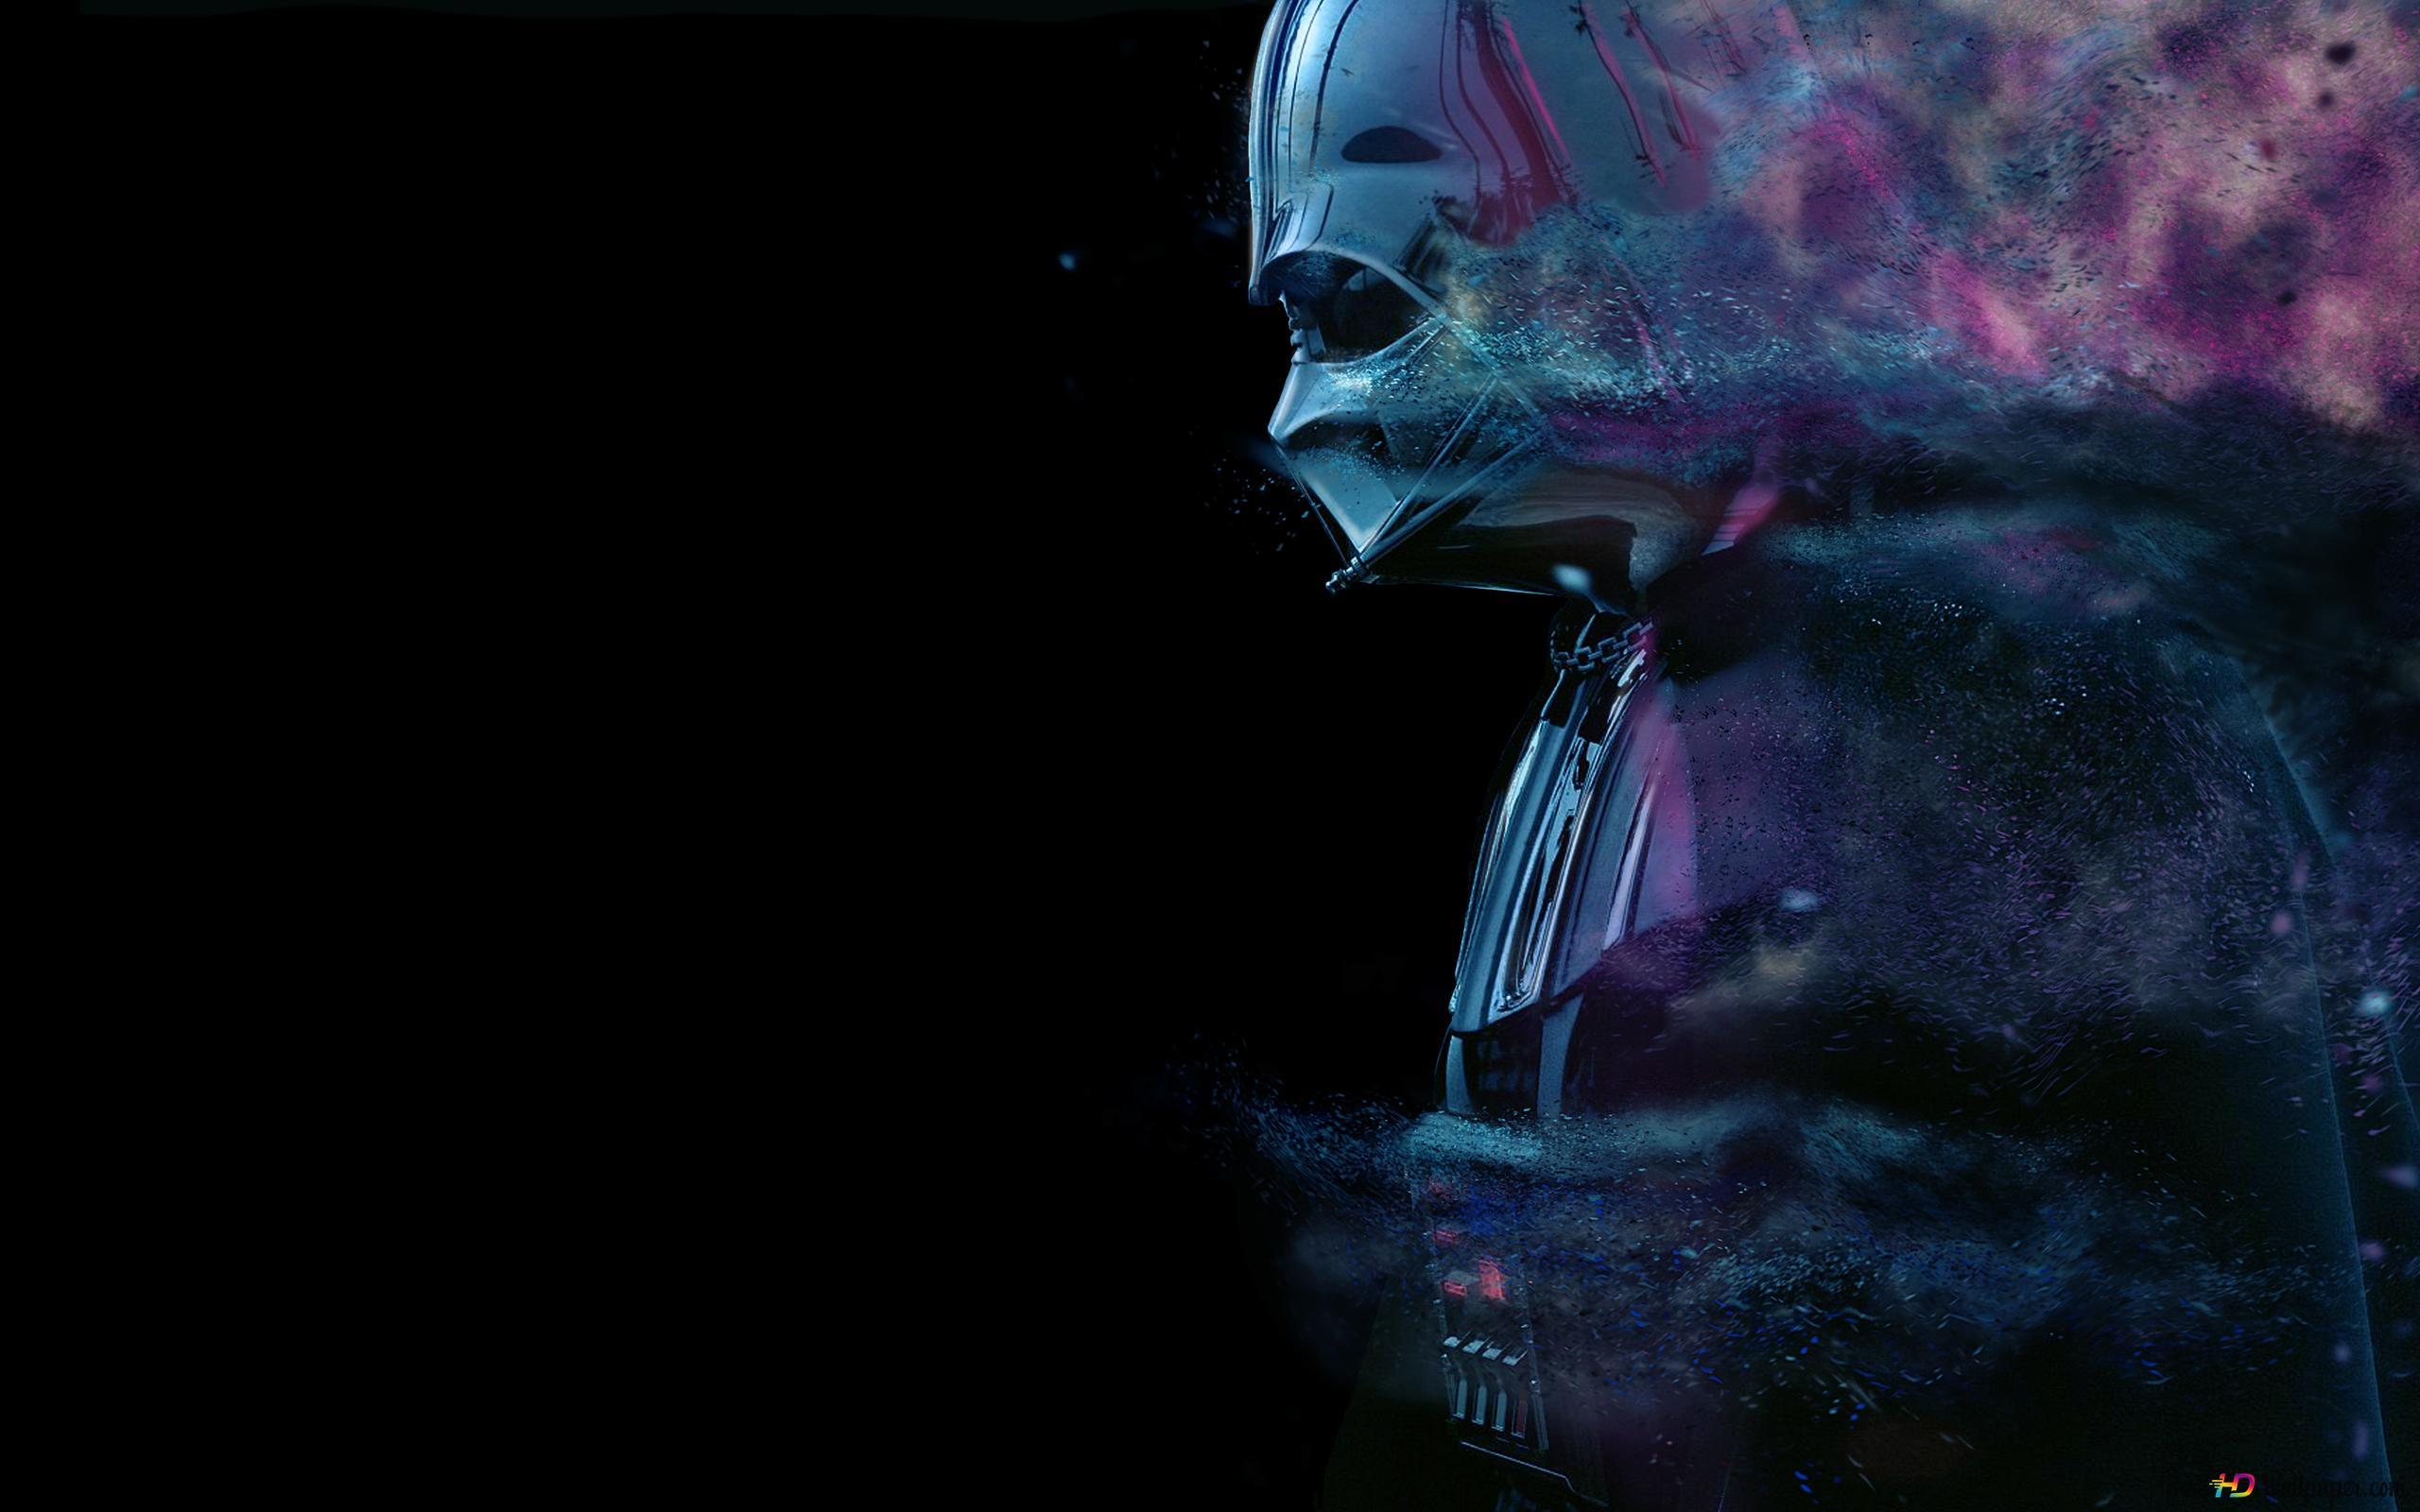 Lebron James Wallpaper Hd Darth Vader Note 10 Plus Wallpaper